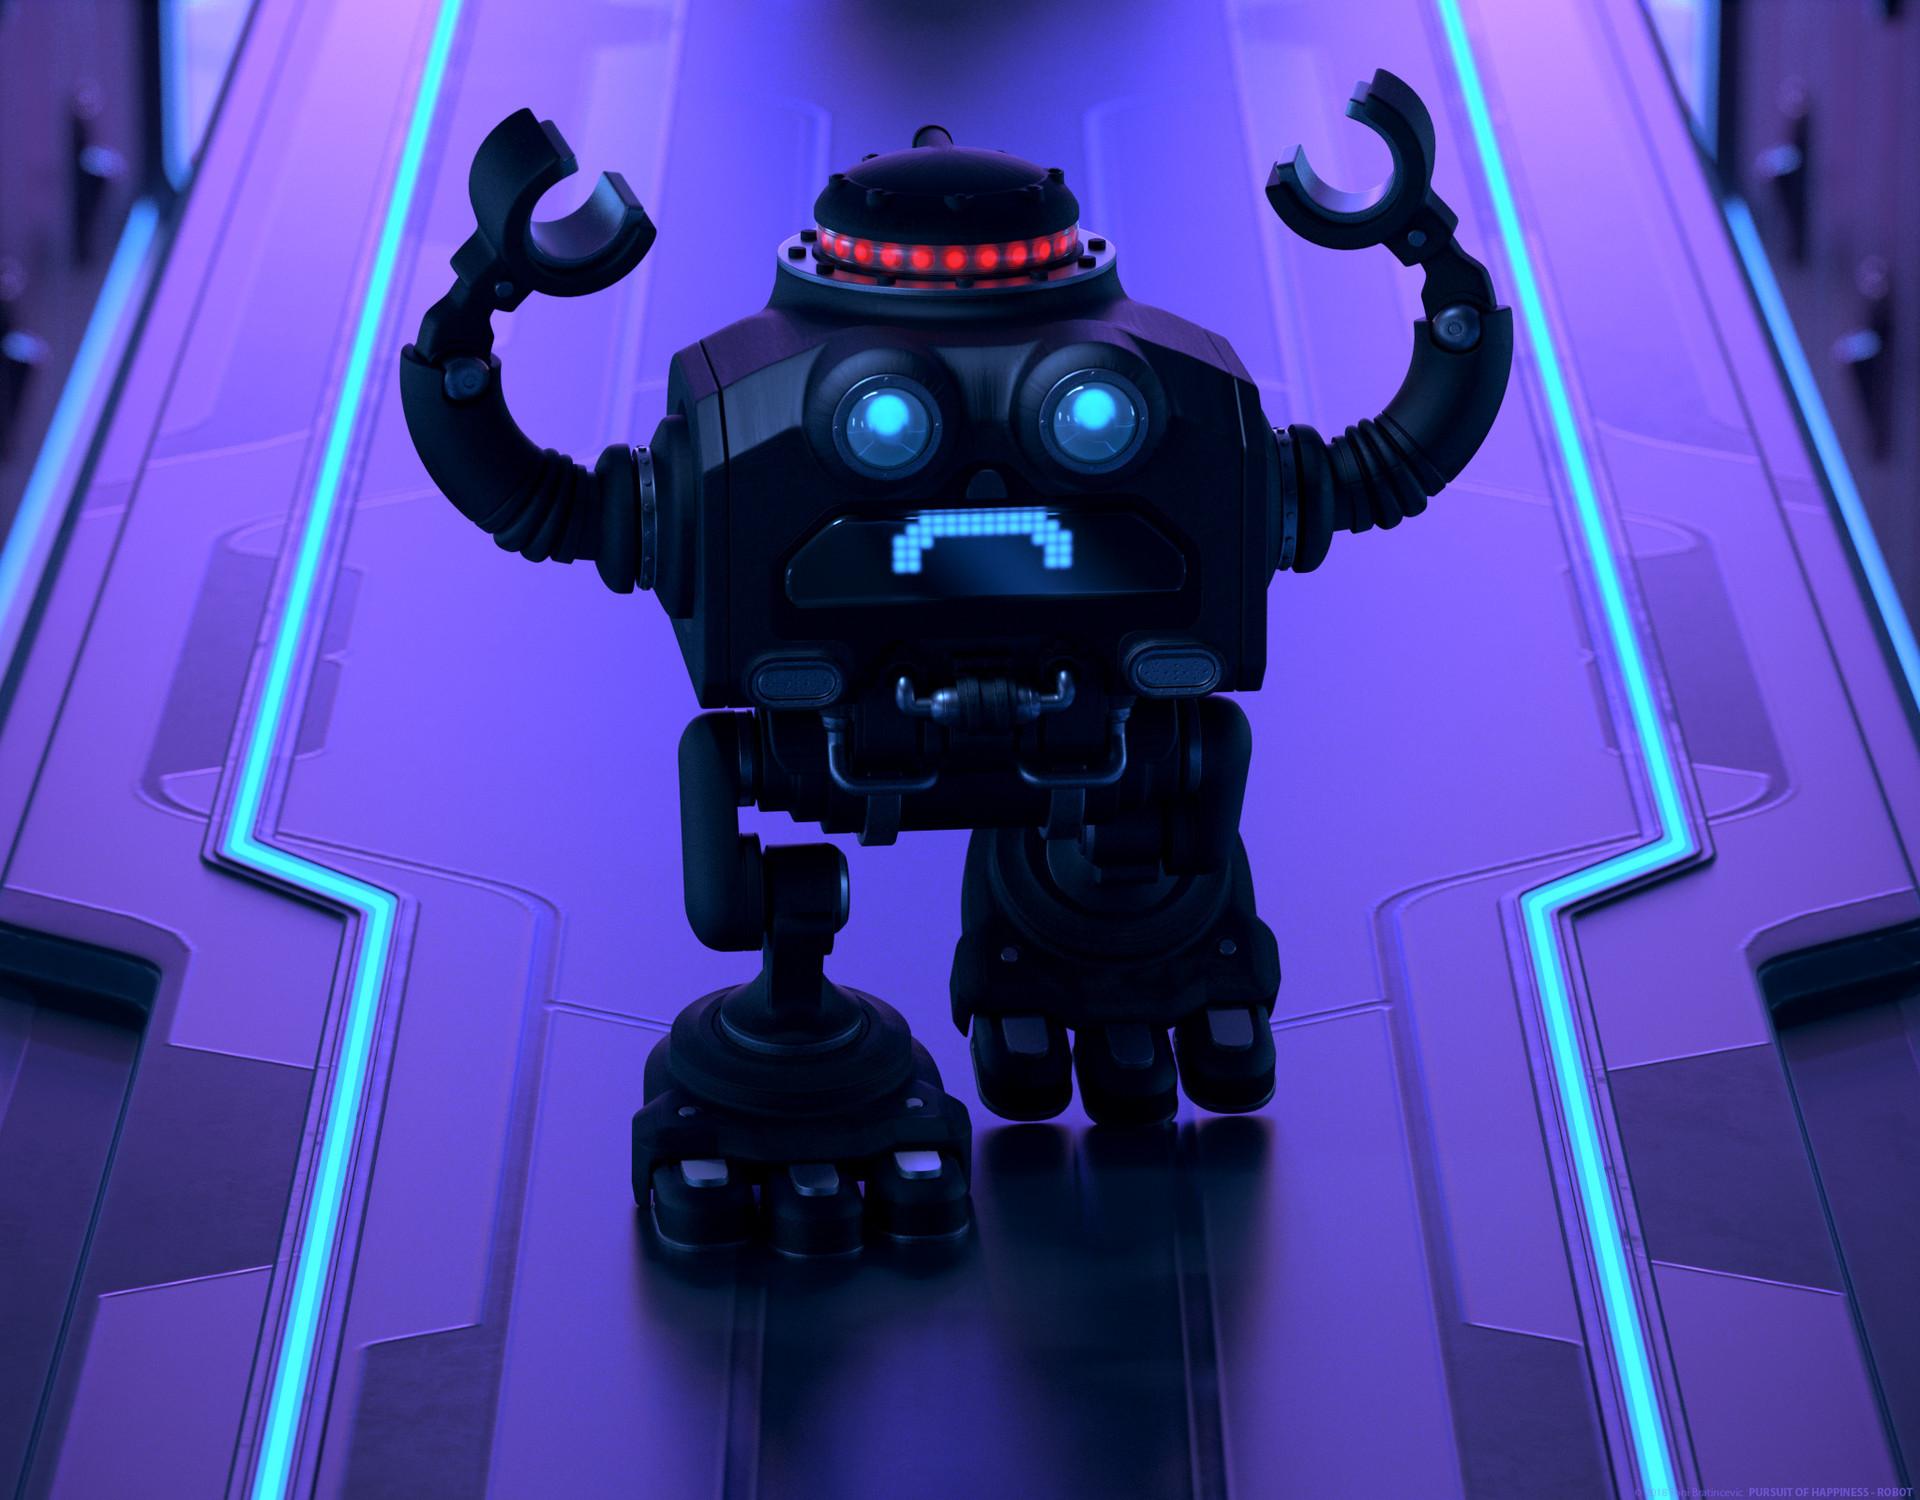 Toni bratincevic pursuit 03 robot